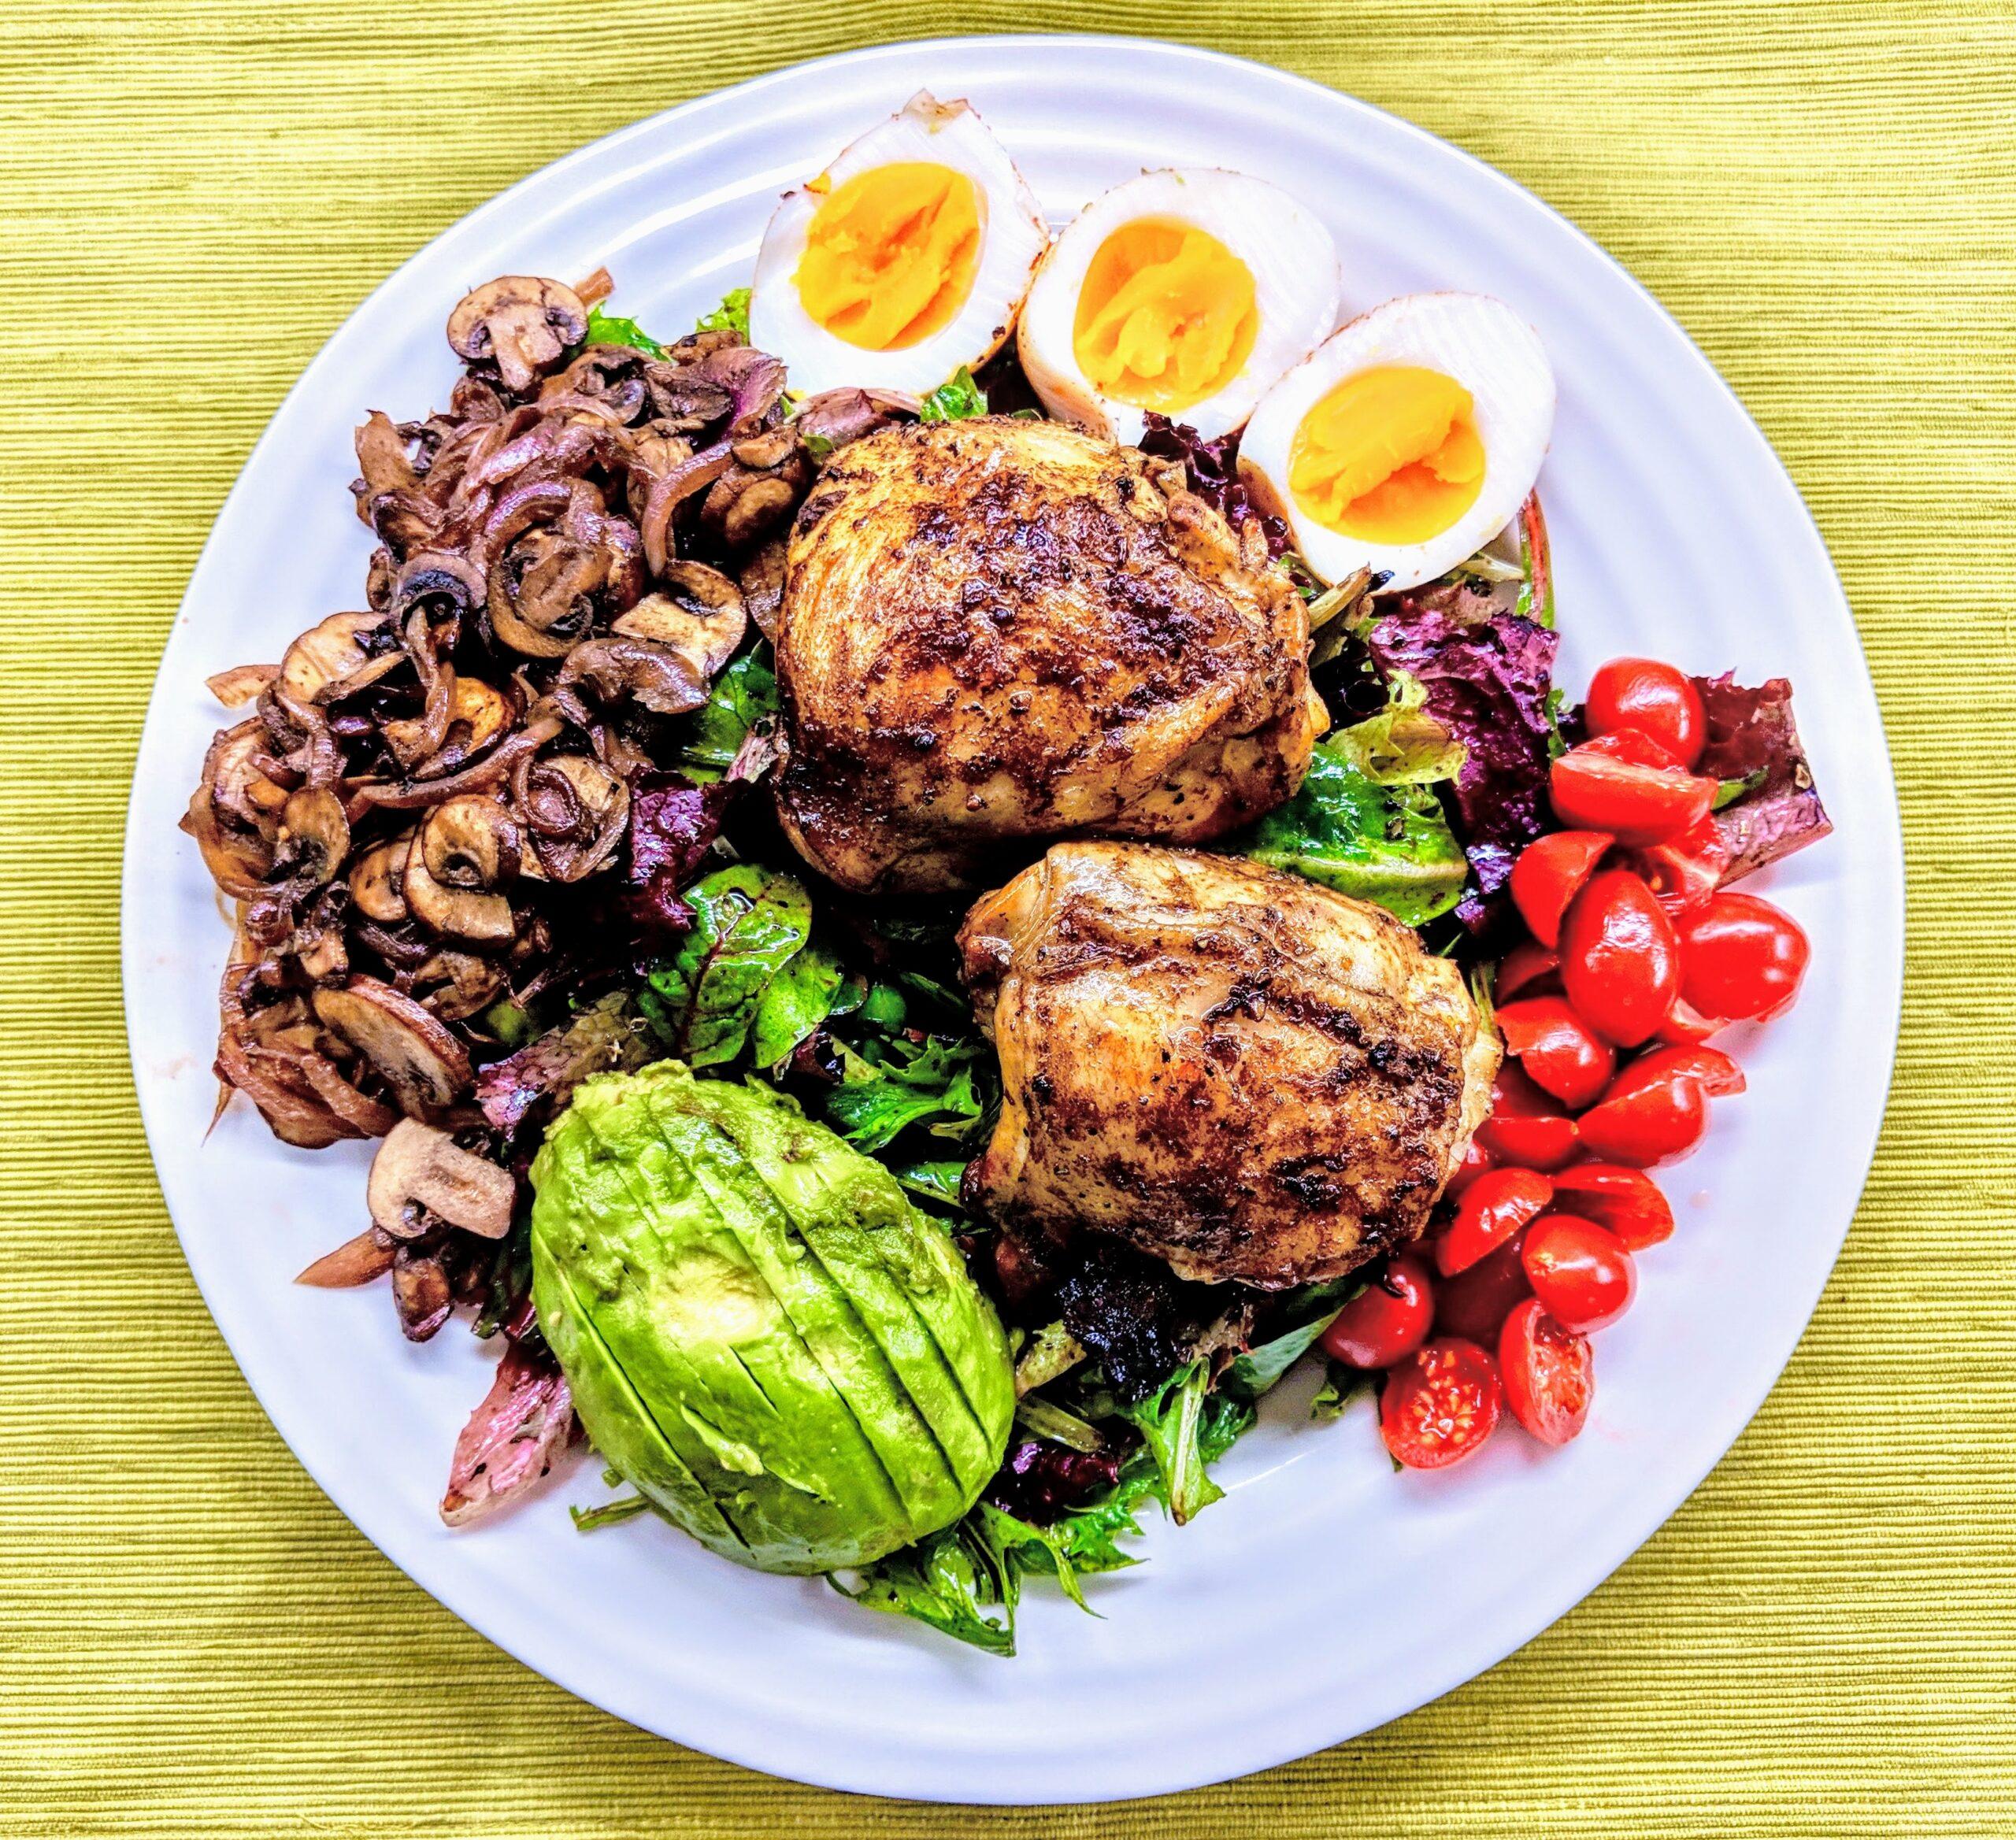 Mediterranean Cobb Salad Paleo, Keto AIP